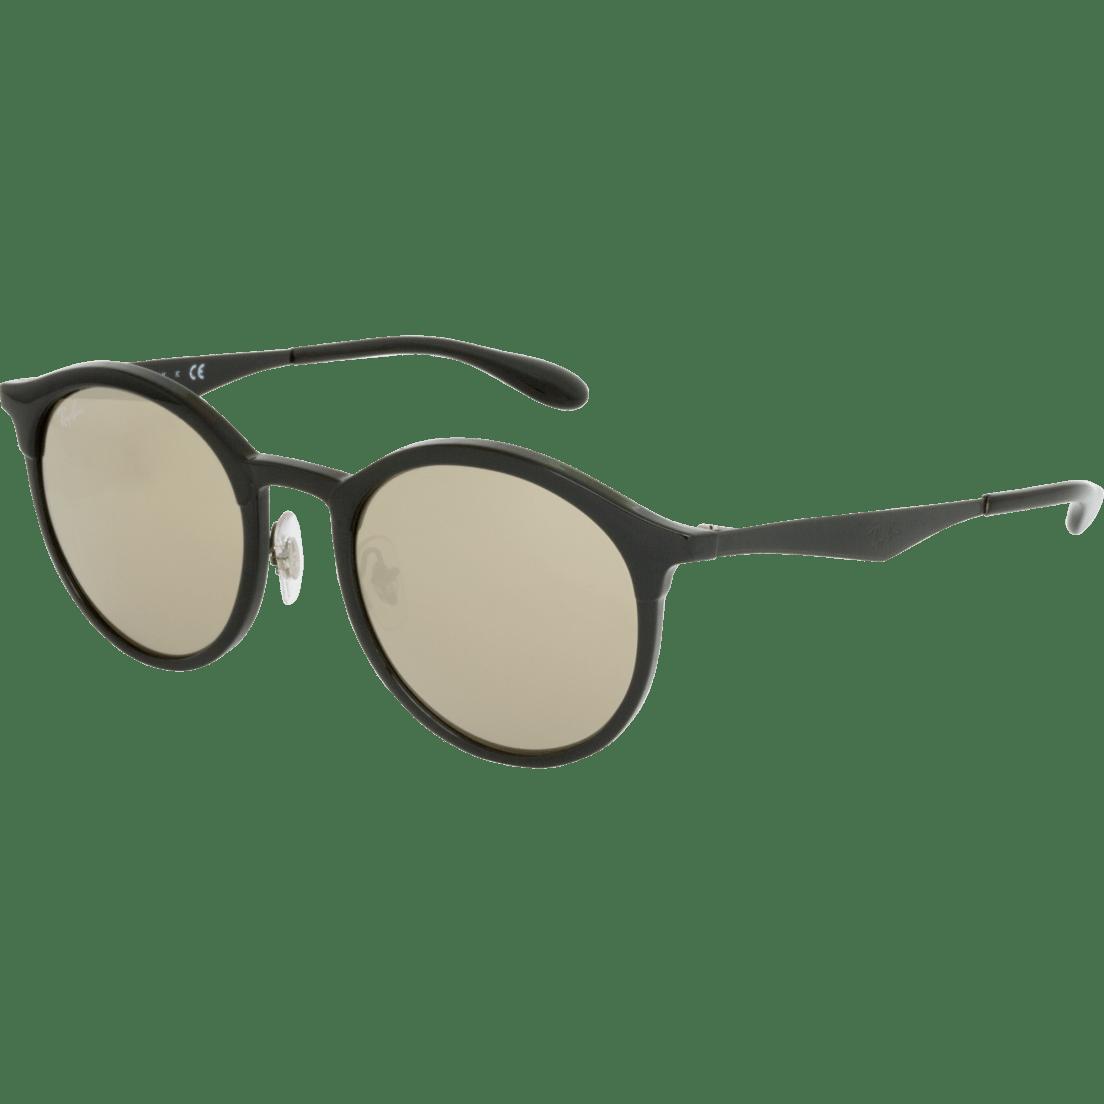 7e0fc27487b16 Ray-Ban Emma RB4277 Sunglasses